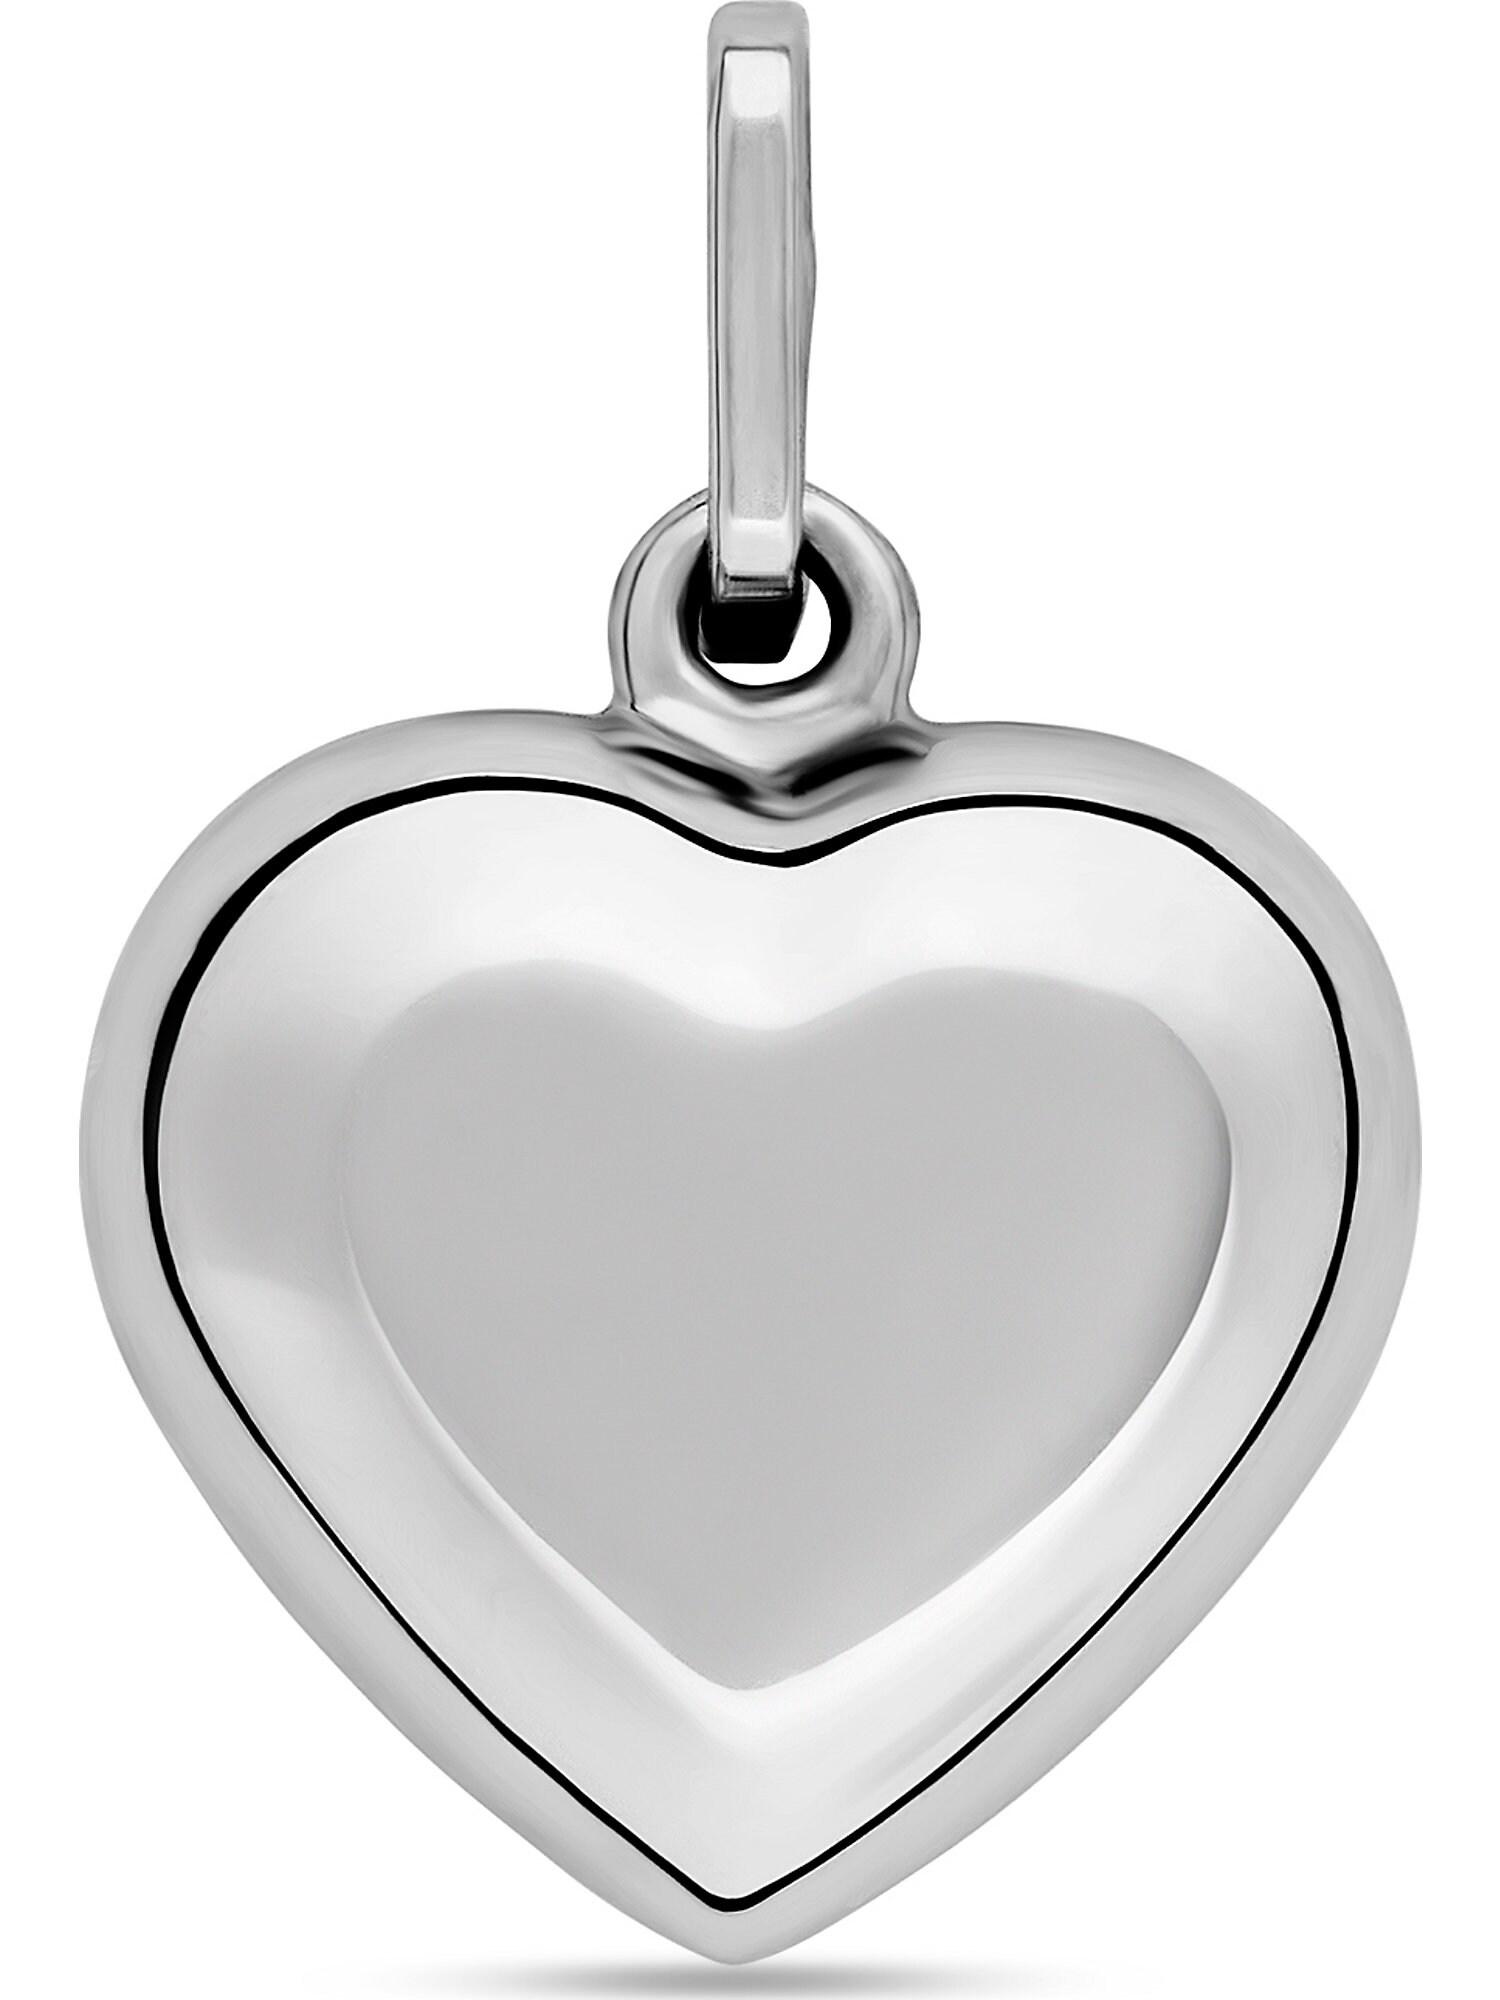 Anhänger 'Herz' | Schmuck > Halsketten > Herzketten | FAVS.